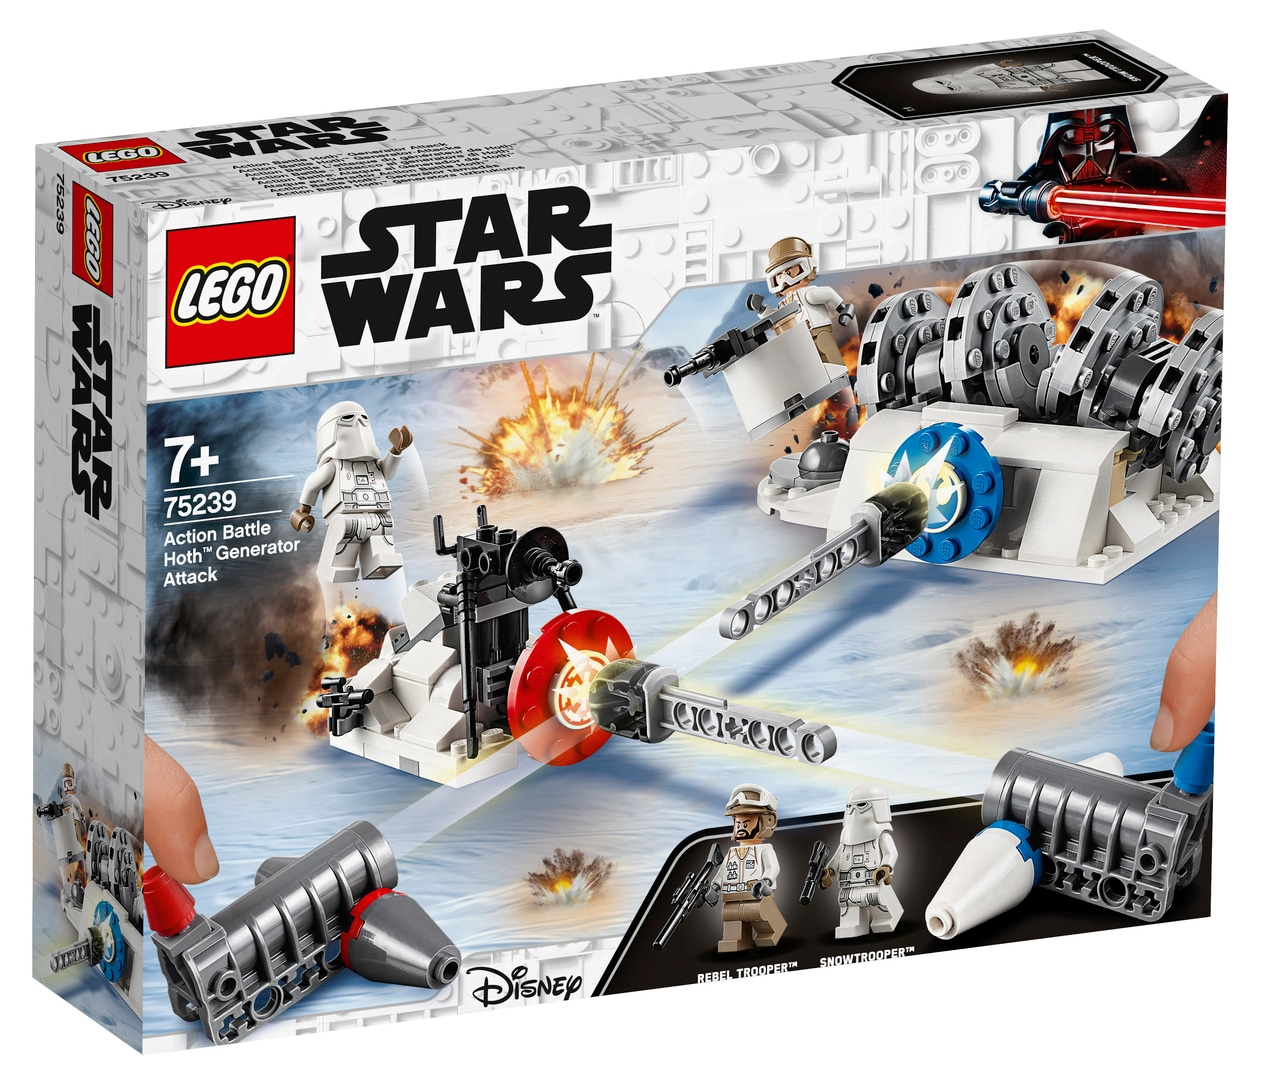 Lego Star Wars April 2019 Alle Sets Ab Jetzt Verfügbar